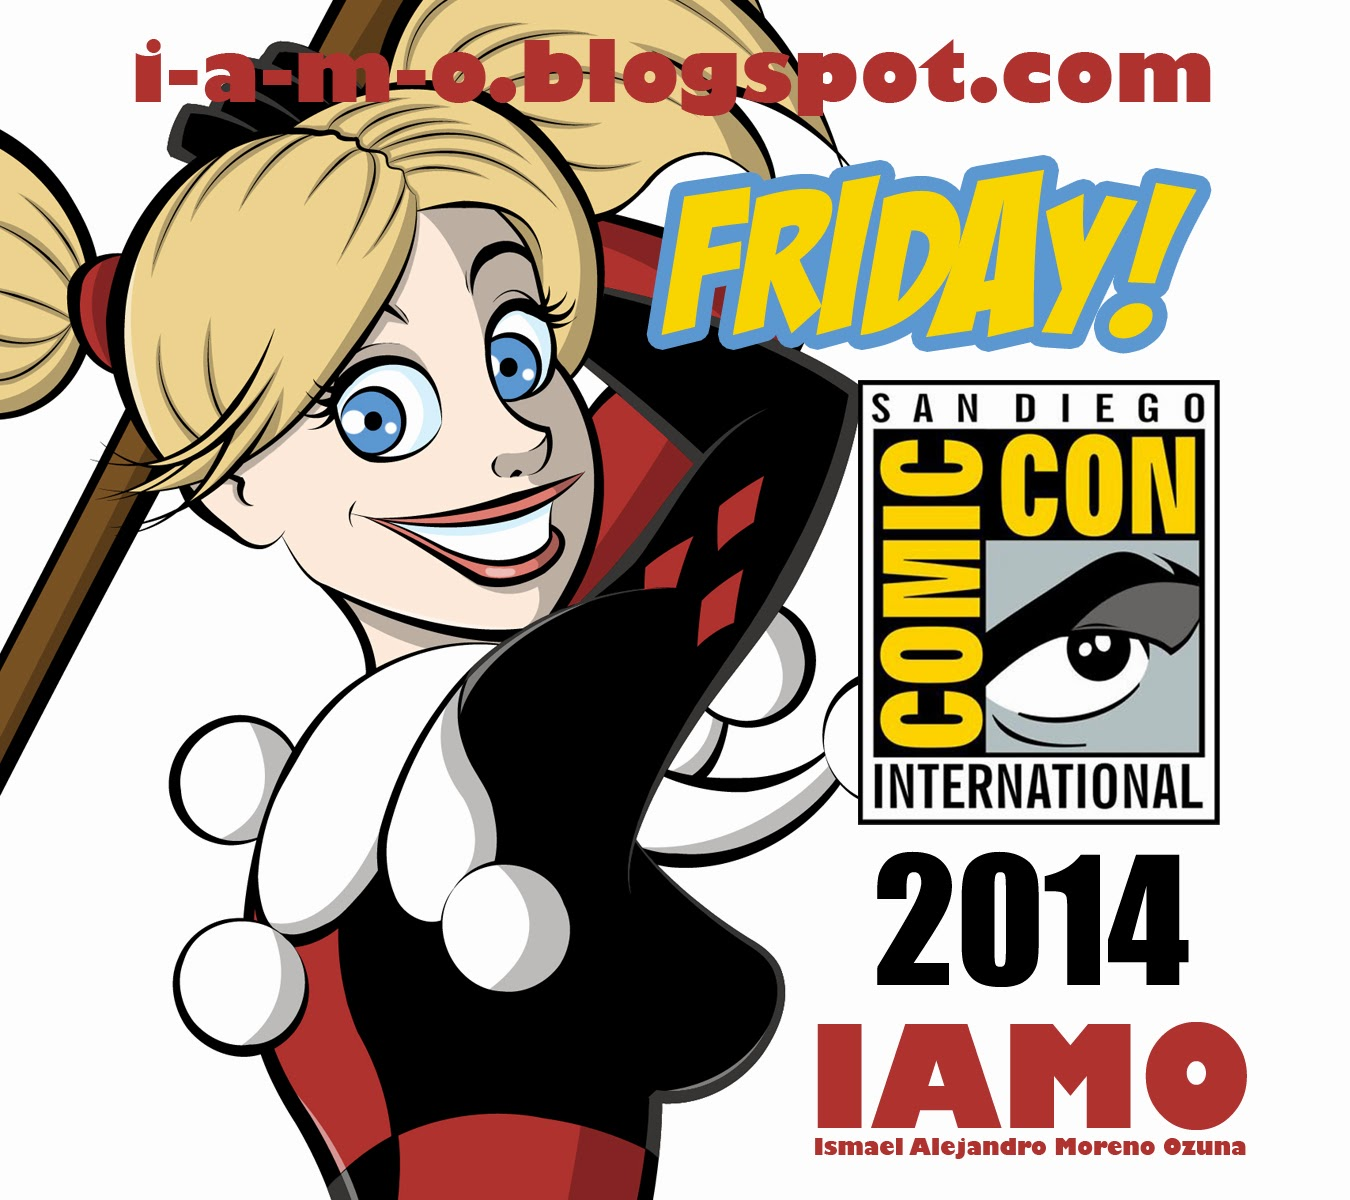 IAMO-SDCC-2014-Friday_Badge+copy.jpg